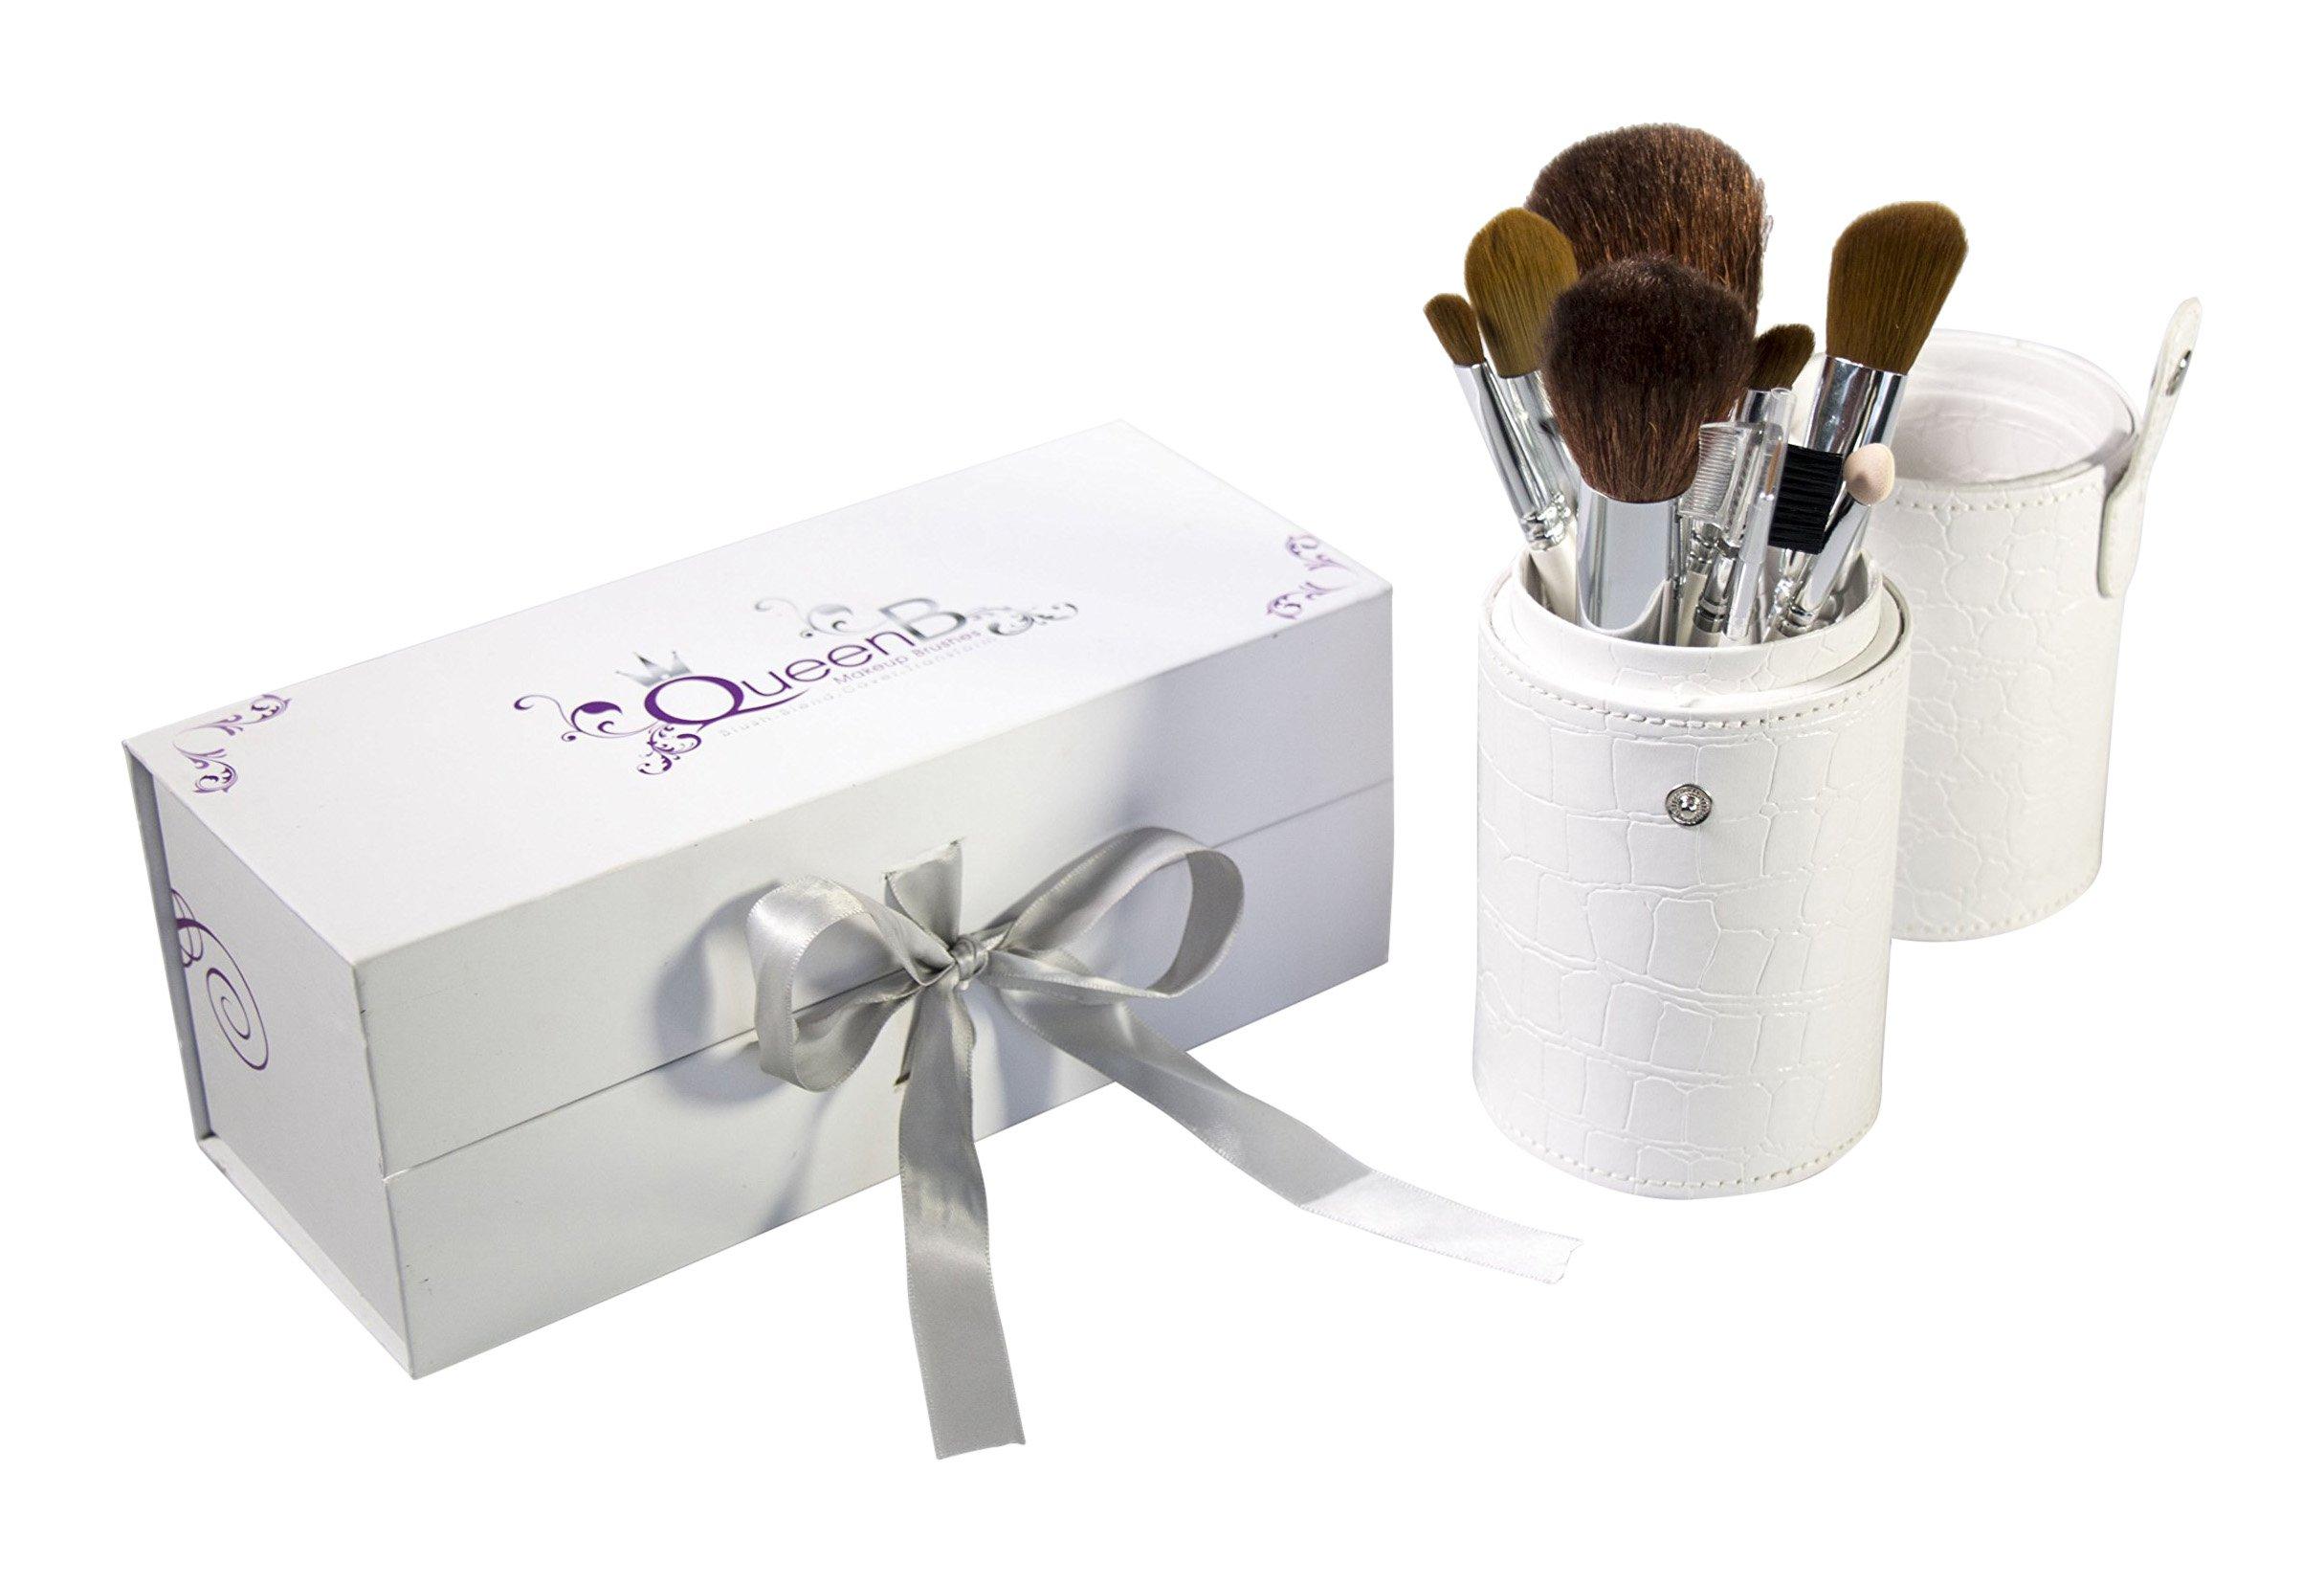 Luxury 10 Piece Makeup Brush Set in Boutique GIFT BOX * Handmade Natural & Synthetic Brushes * Soft & Dense * White Leather Designer Case * 1 Year Guarantee * Free Travel Lip Brush